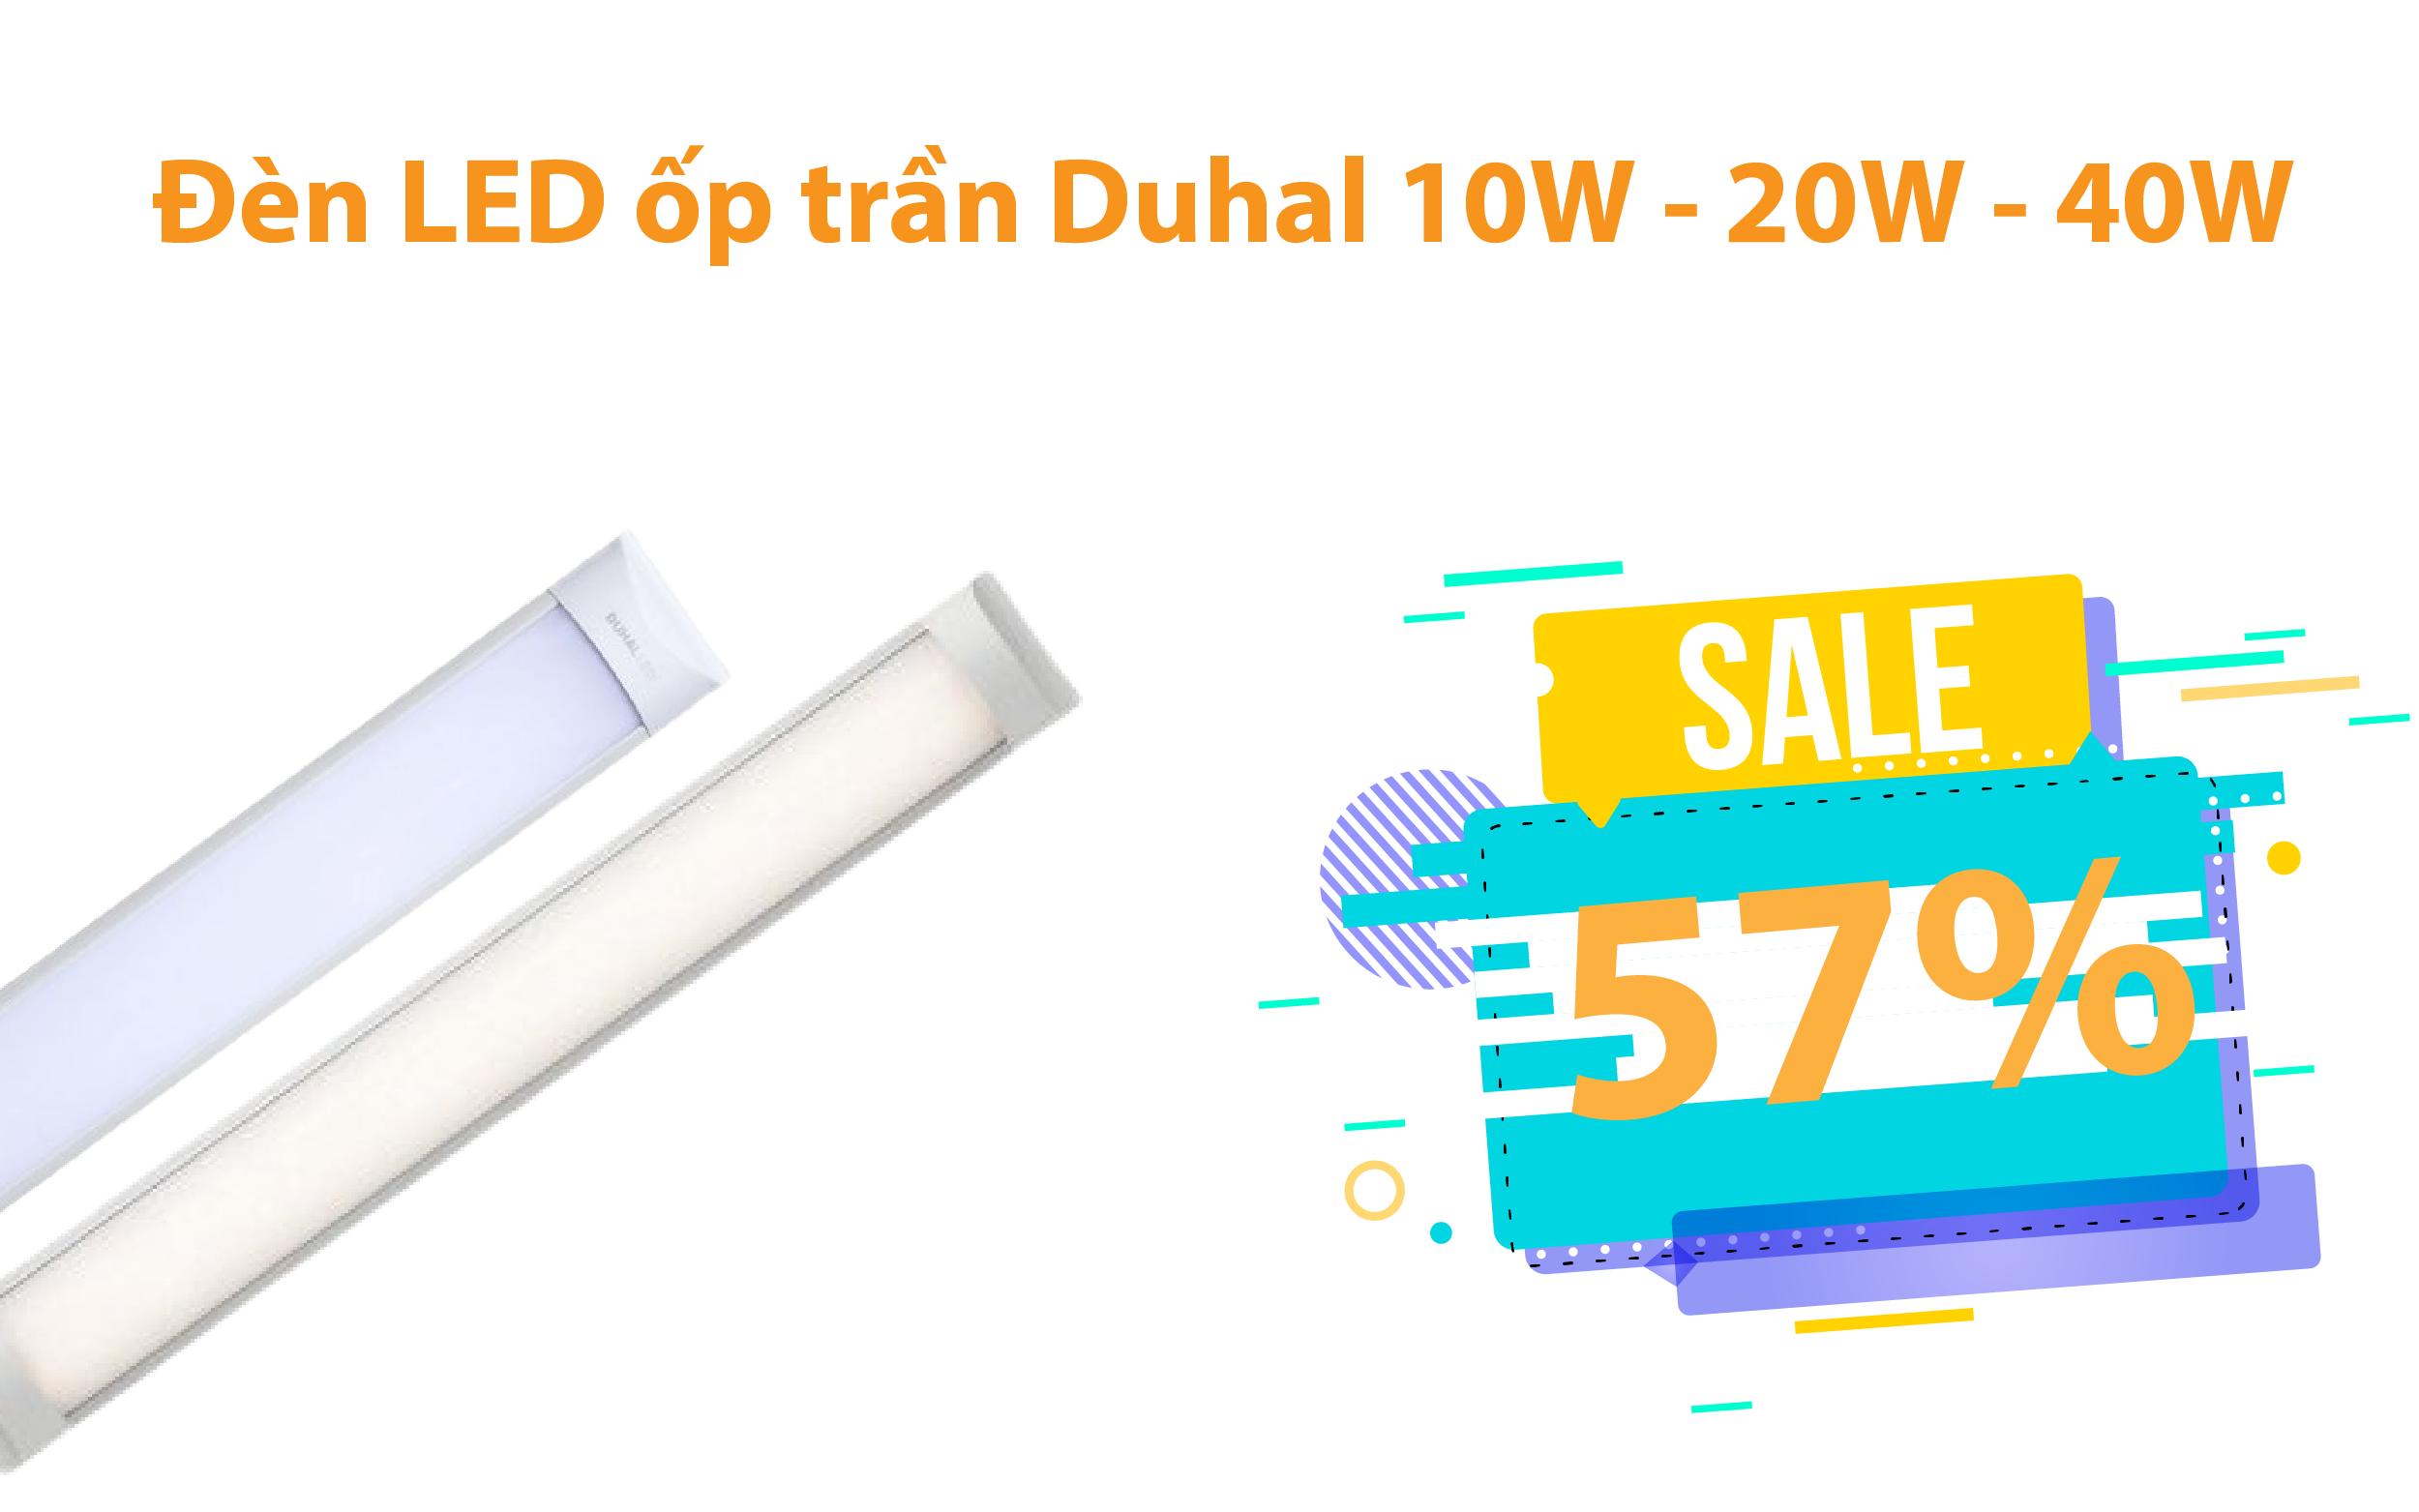 Đèn LED ốp trần Duhal 10W - 20W - 40W giảm từ 52% - 57%